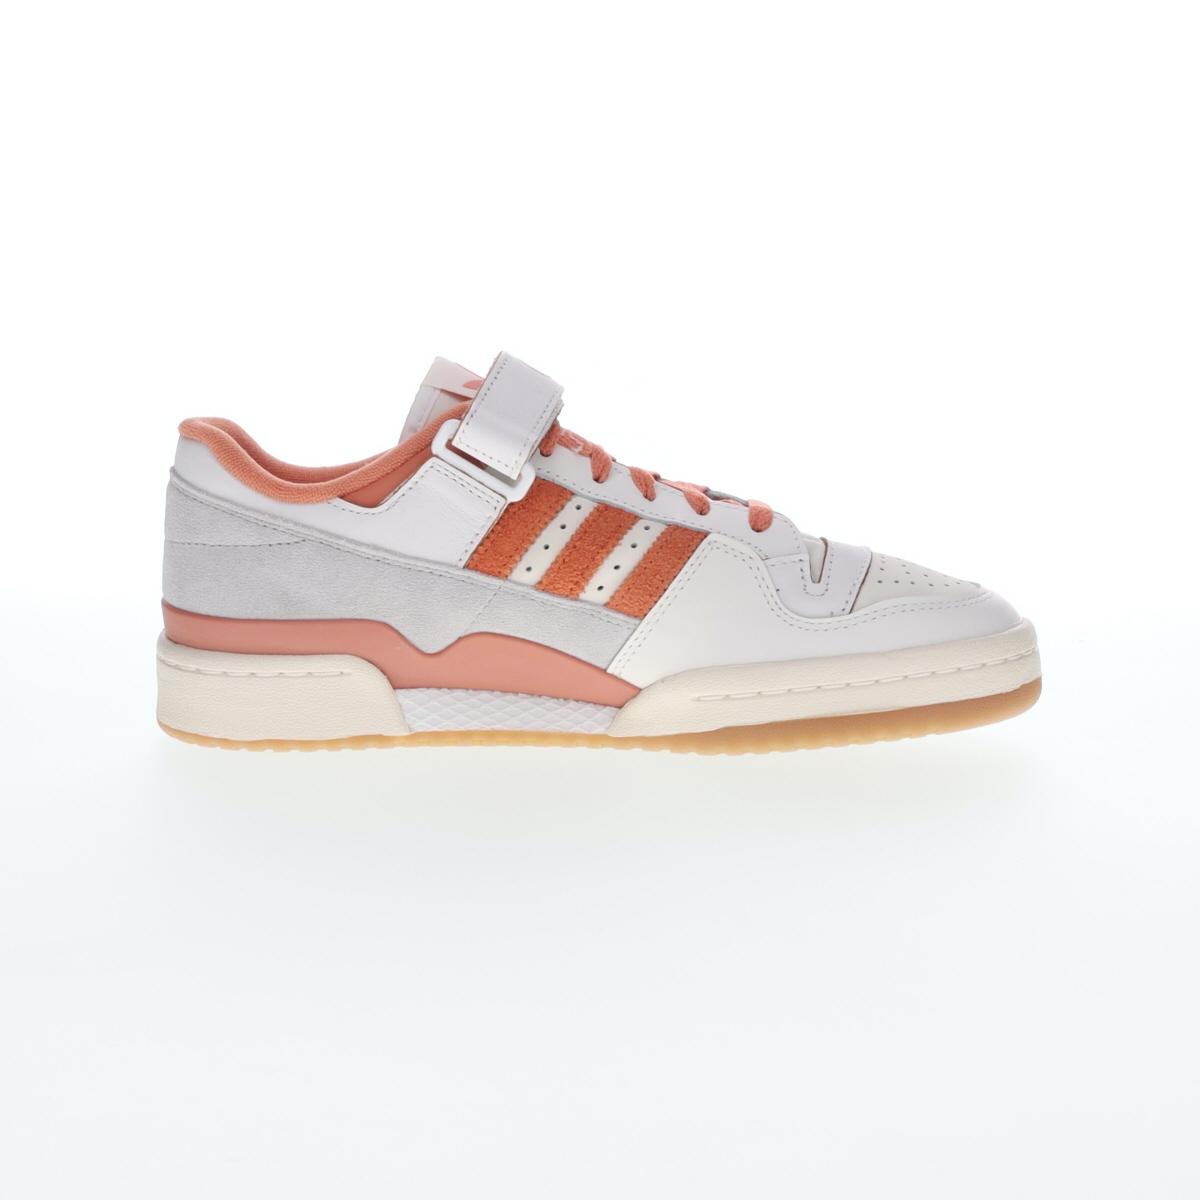 adidas nmd womens cream pink color code